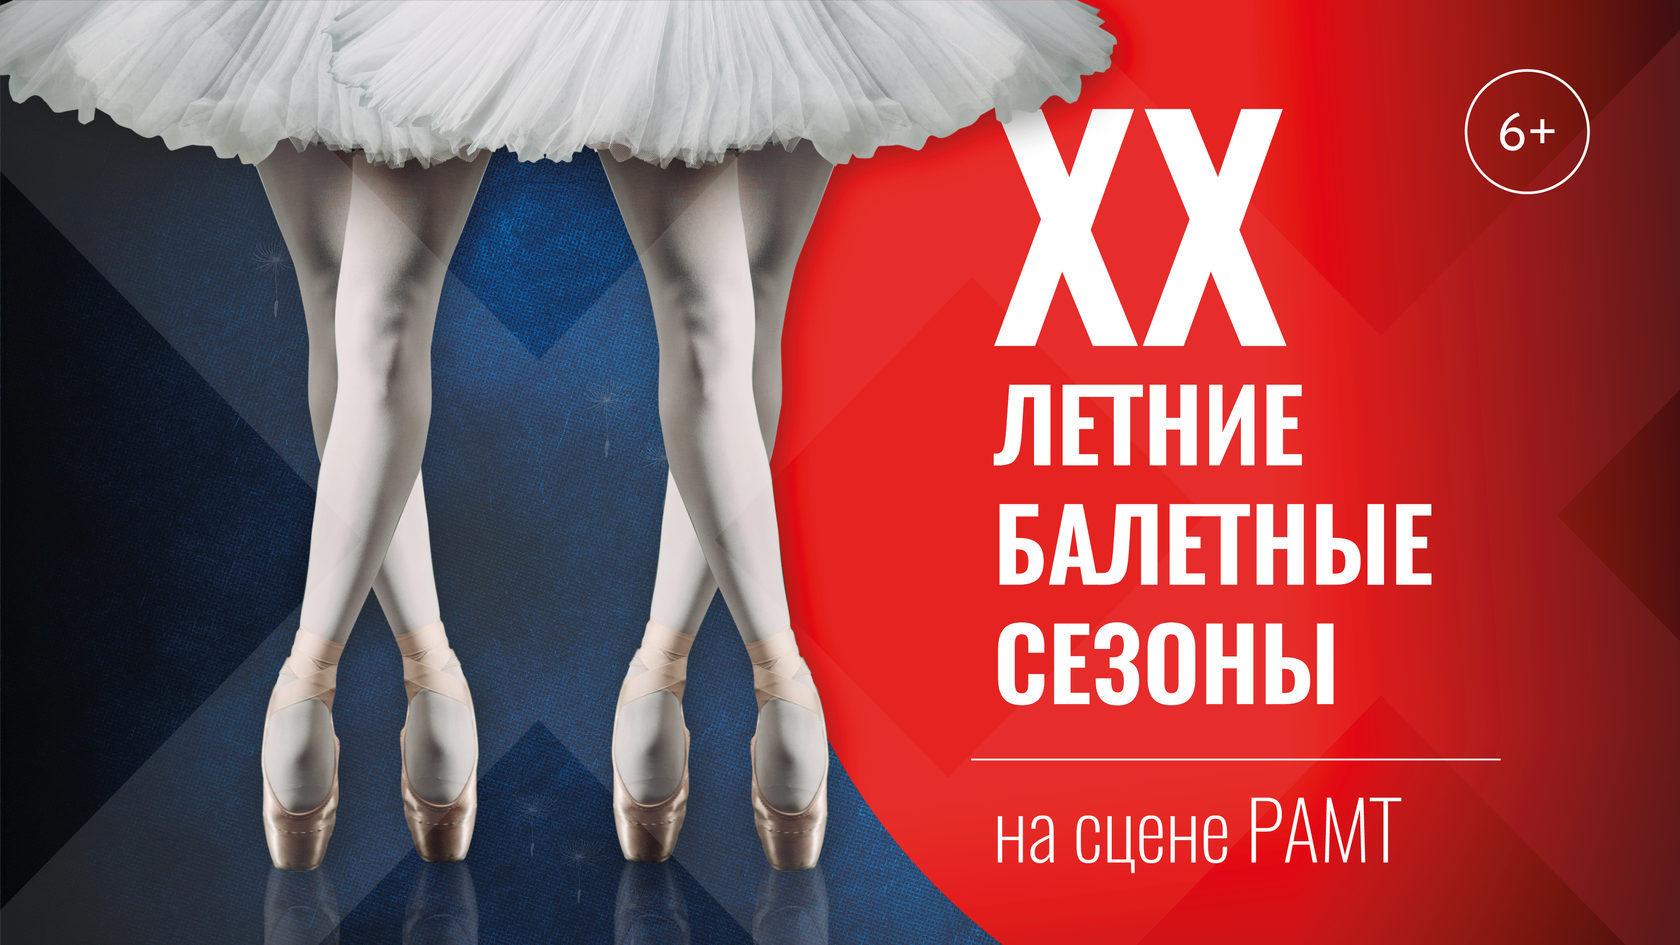 (c) Ballet-letom.ru